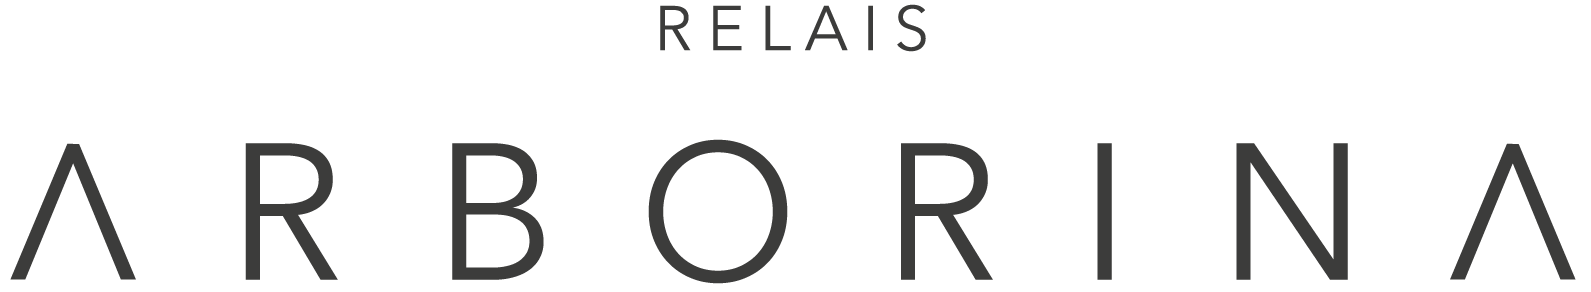 Arborina Relais